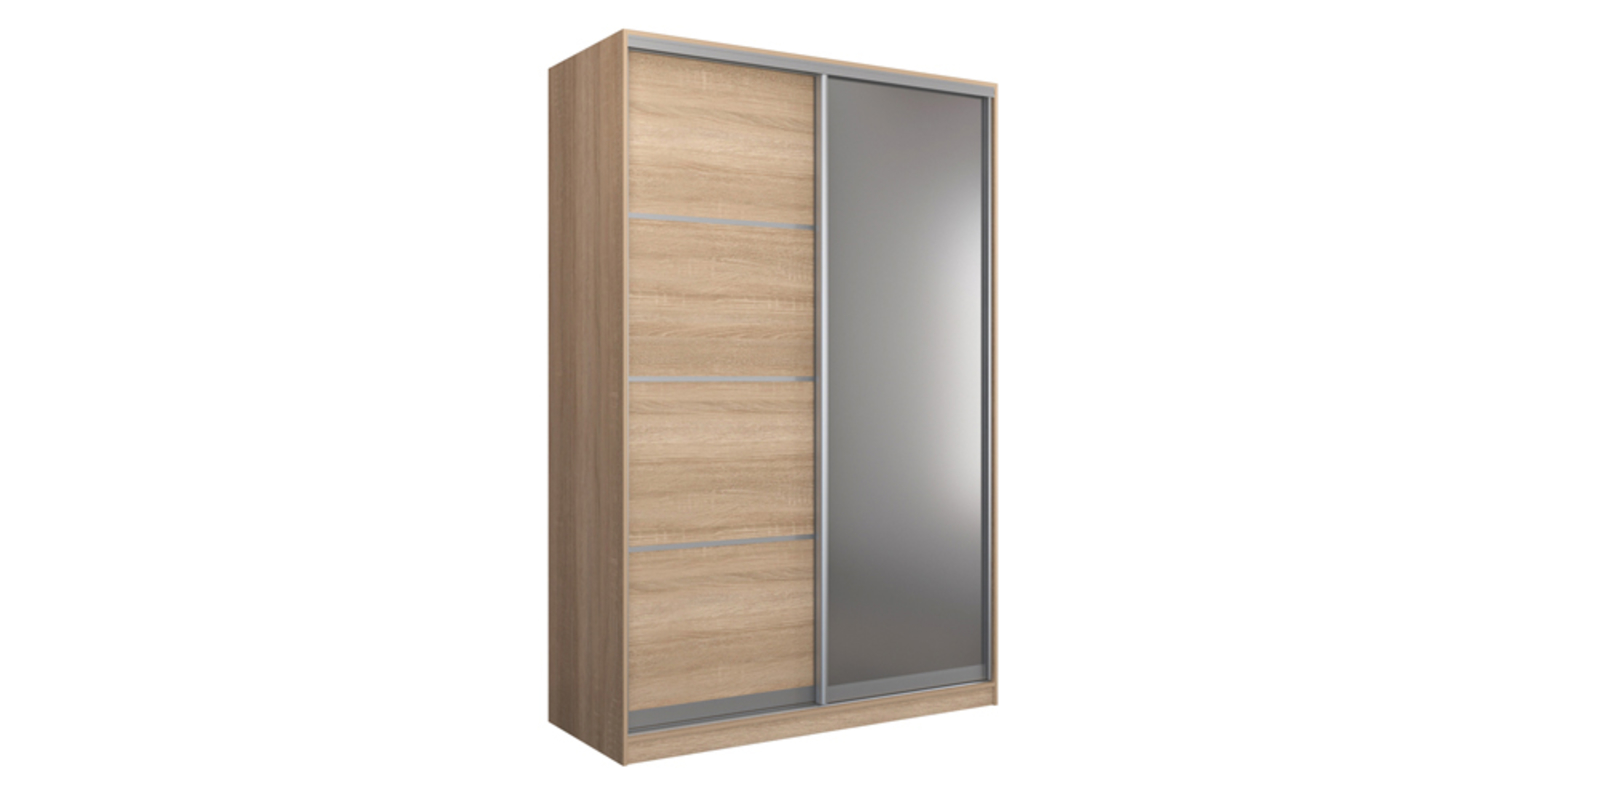 Шкаф-купе двухдверный Манхеттен 160 см (сонома+зеркало)